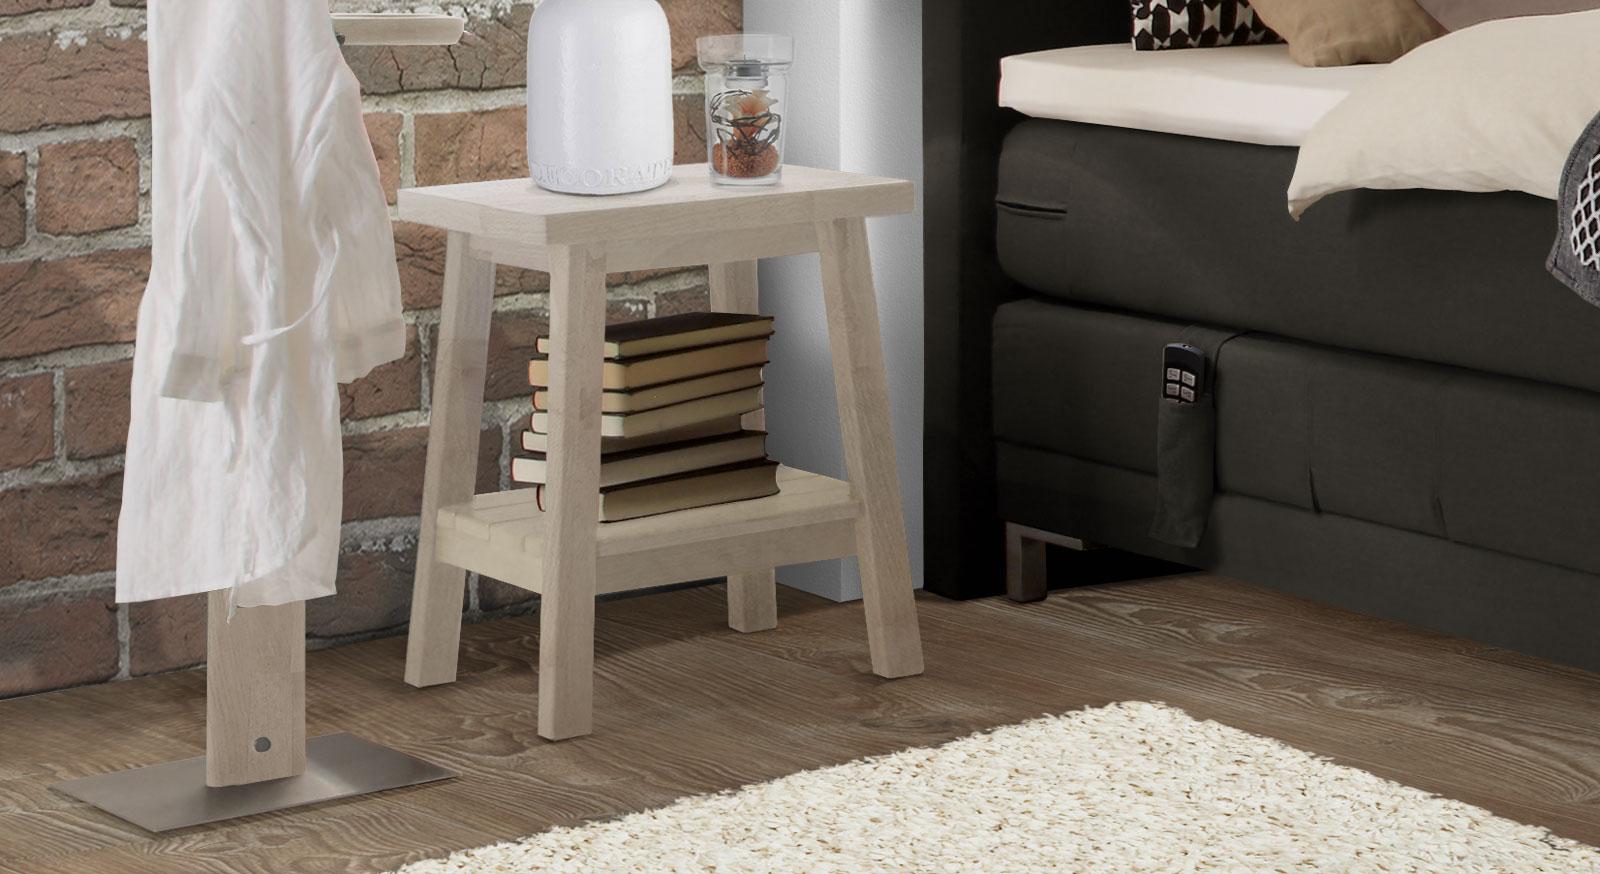 nachttisch boxspringbett buche. Black Bedroom Furniture Sets. Home Design Ideas